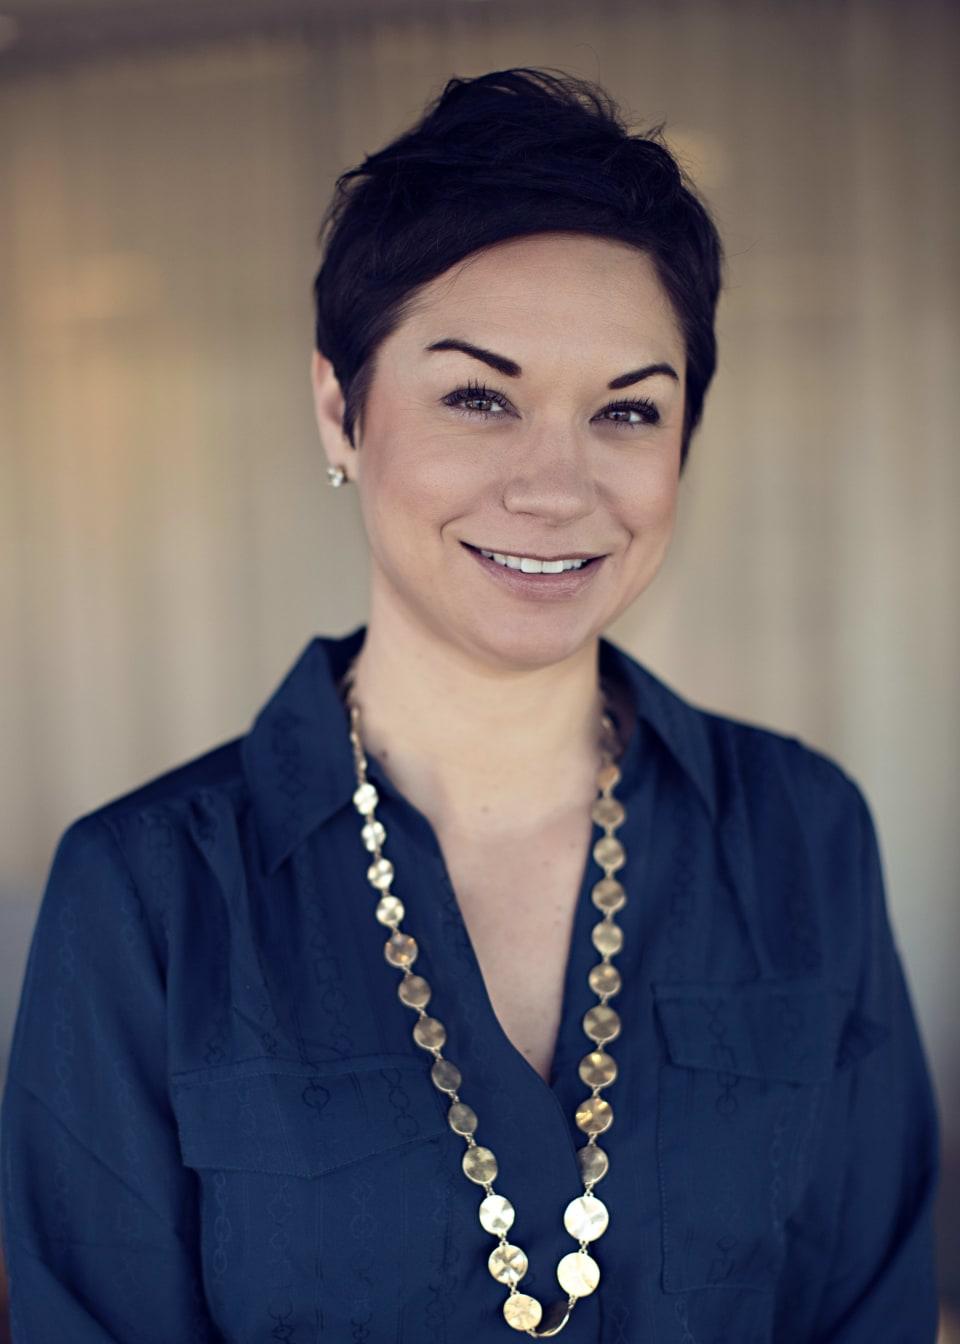 Erin Marandola